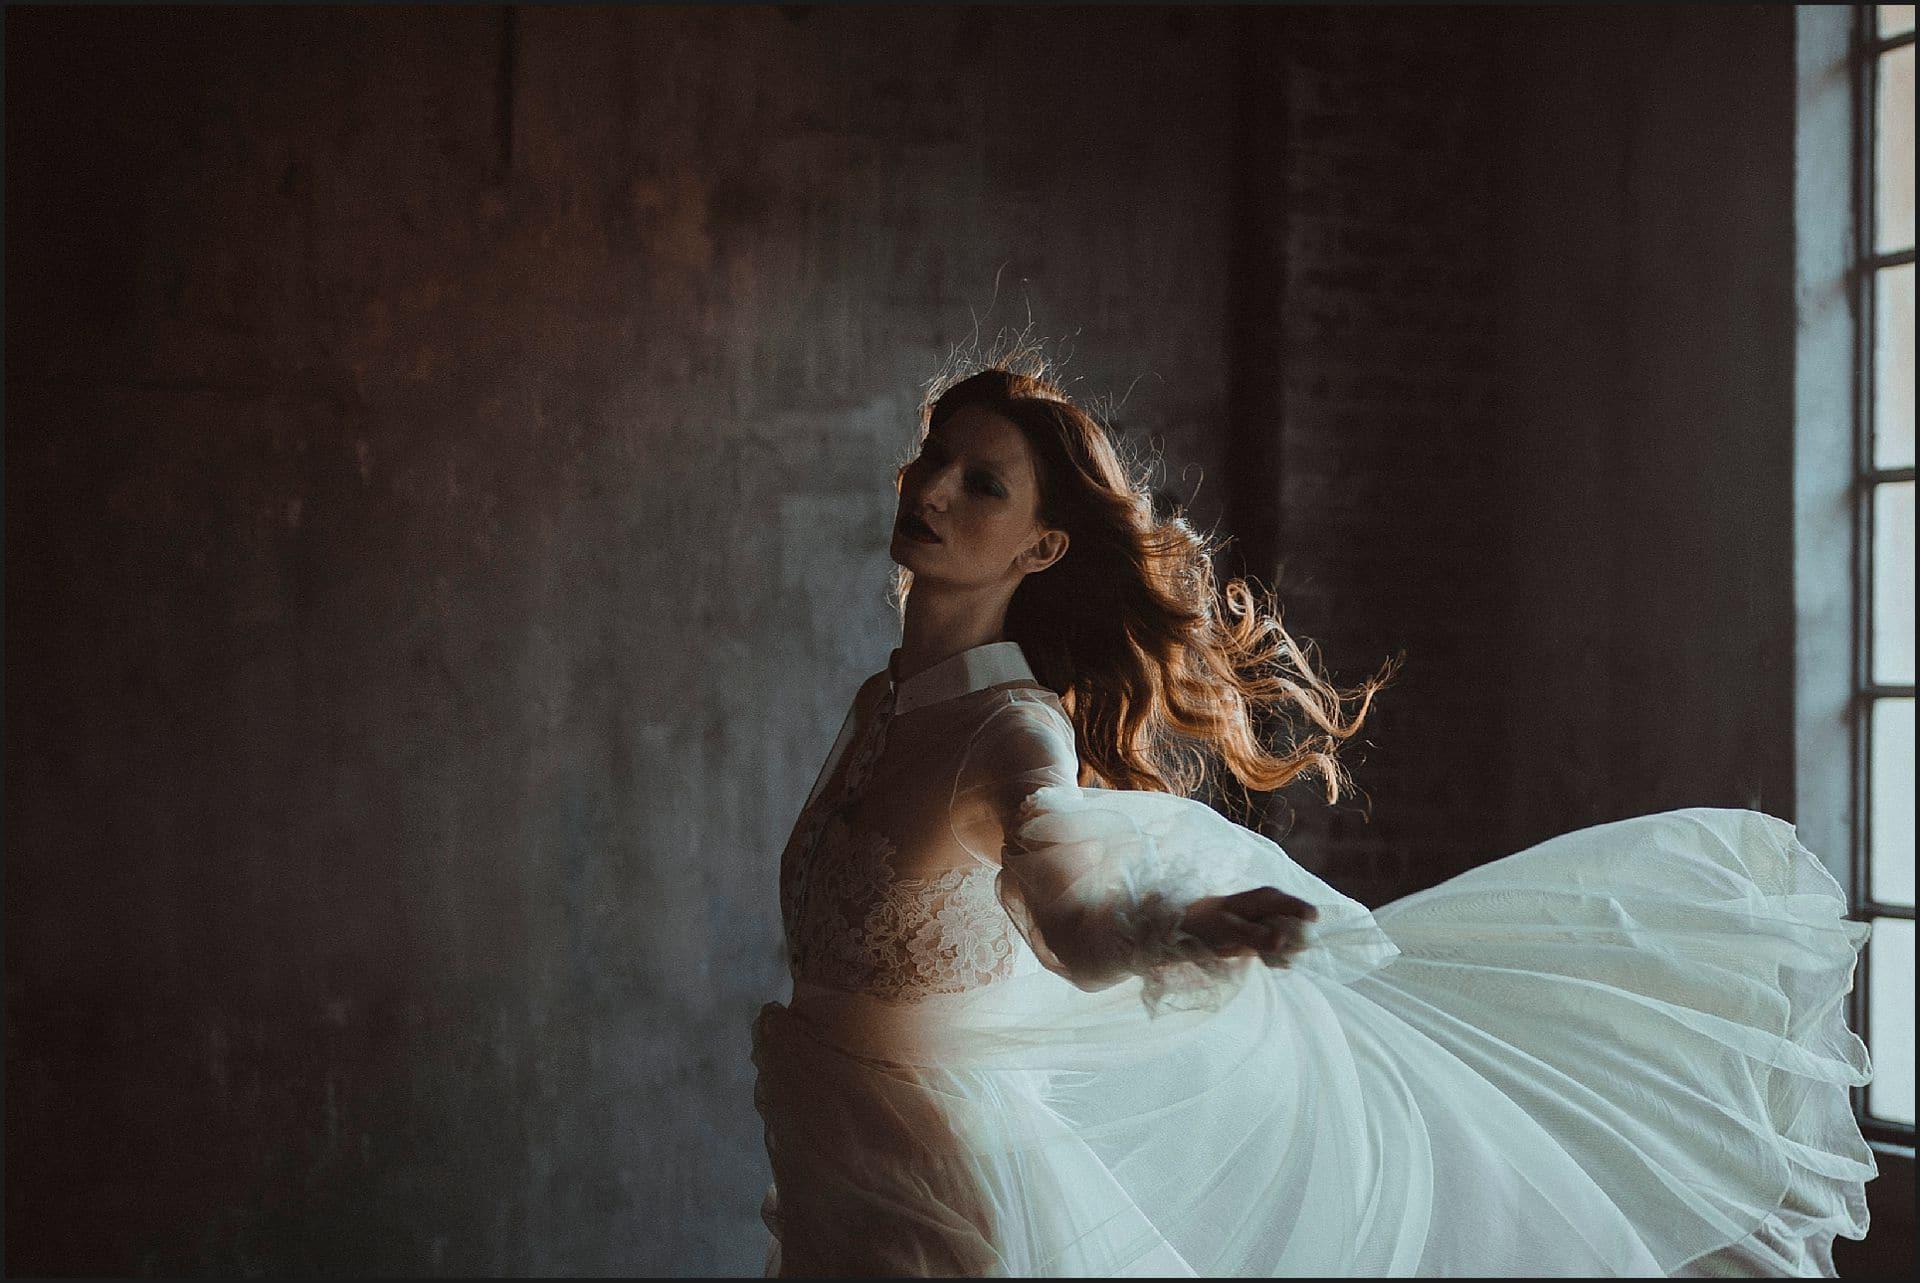 wind, bride, hair, unconventional wedding, cross studio, milan, wedding photographer, wedding in italy